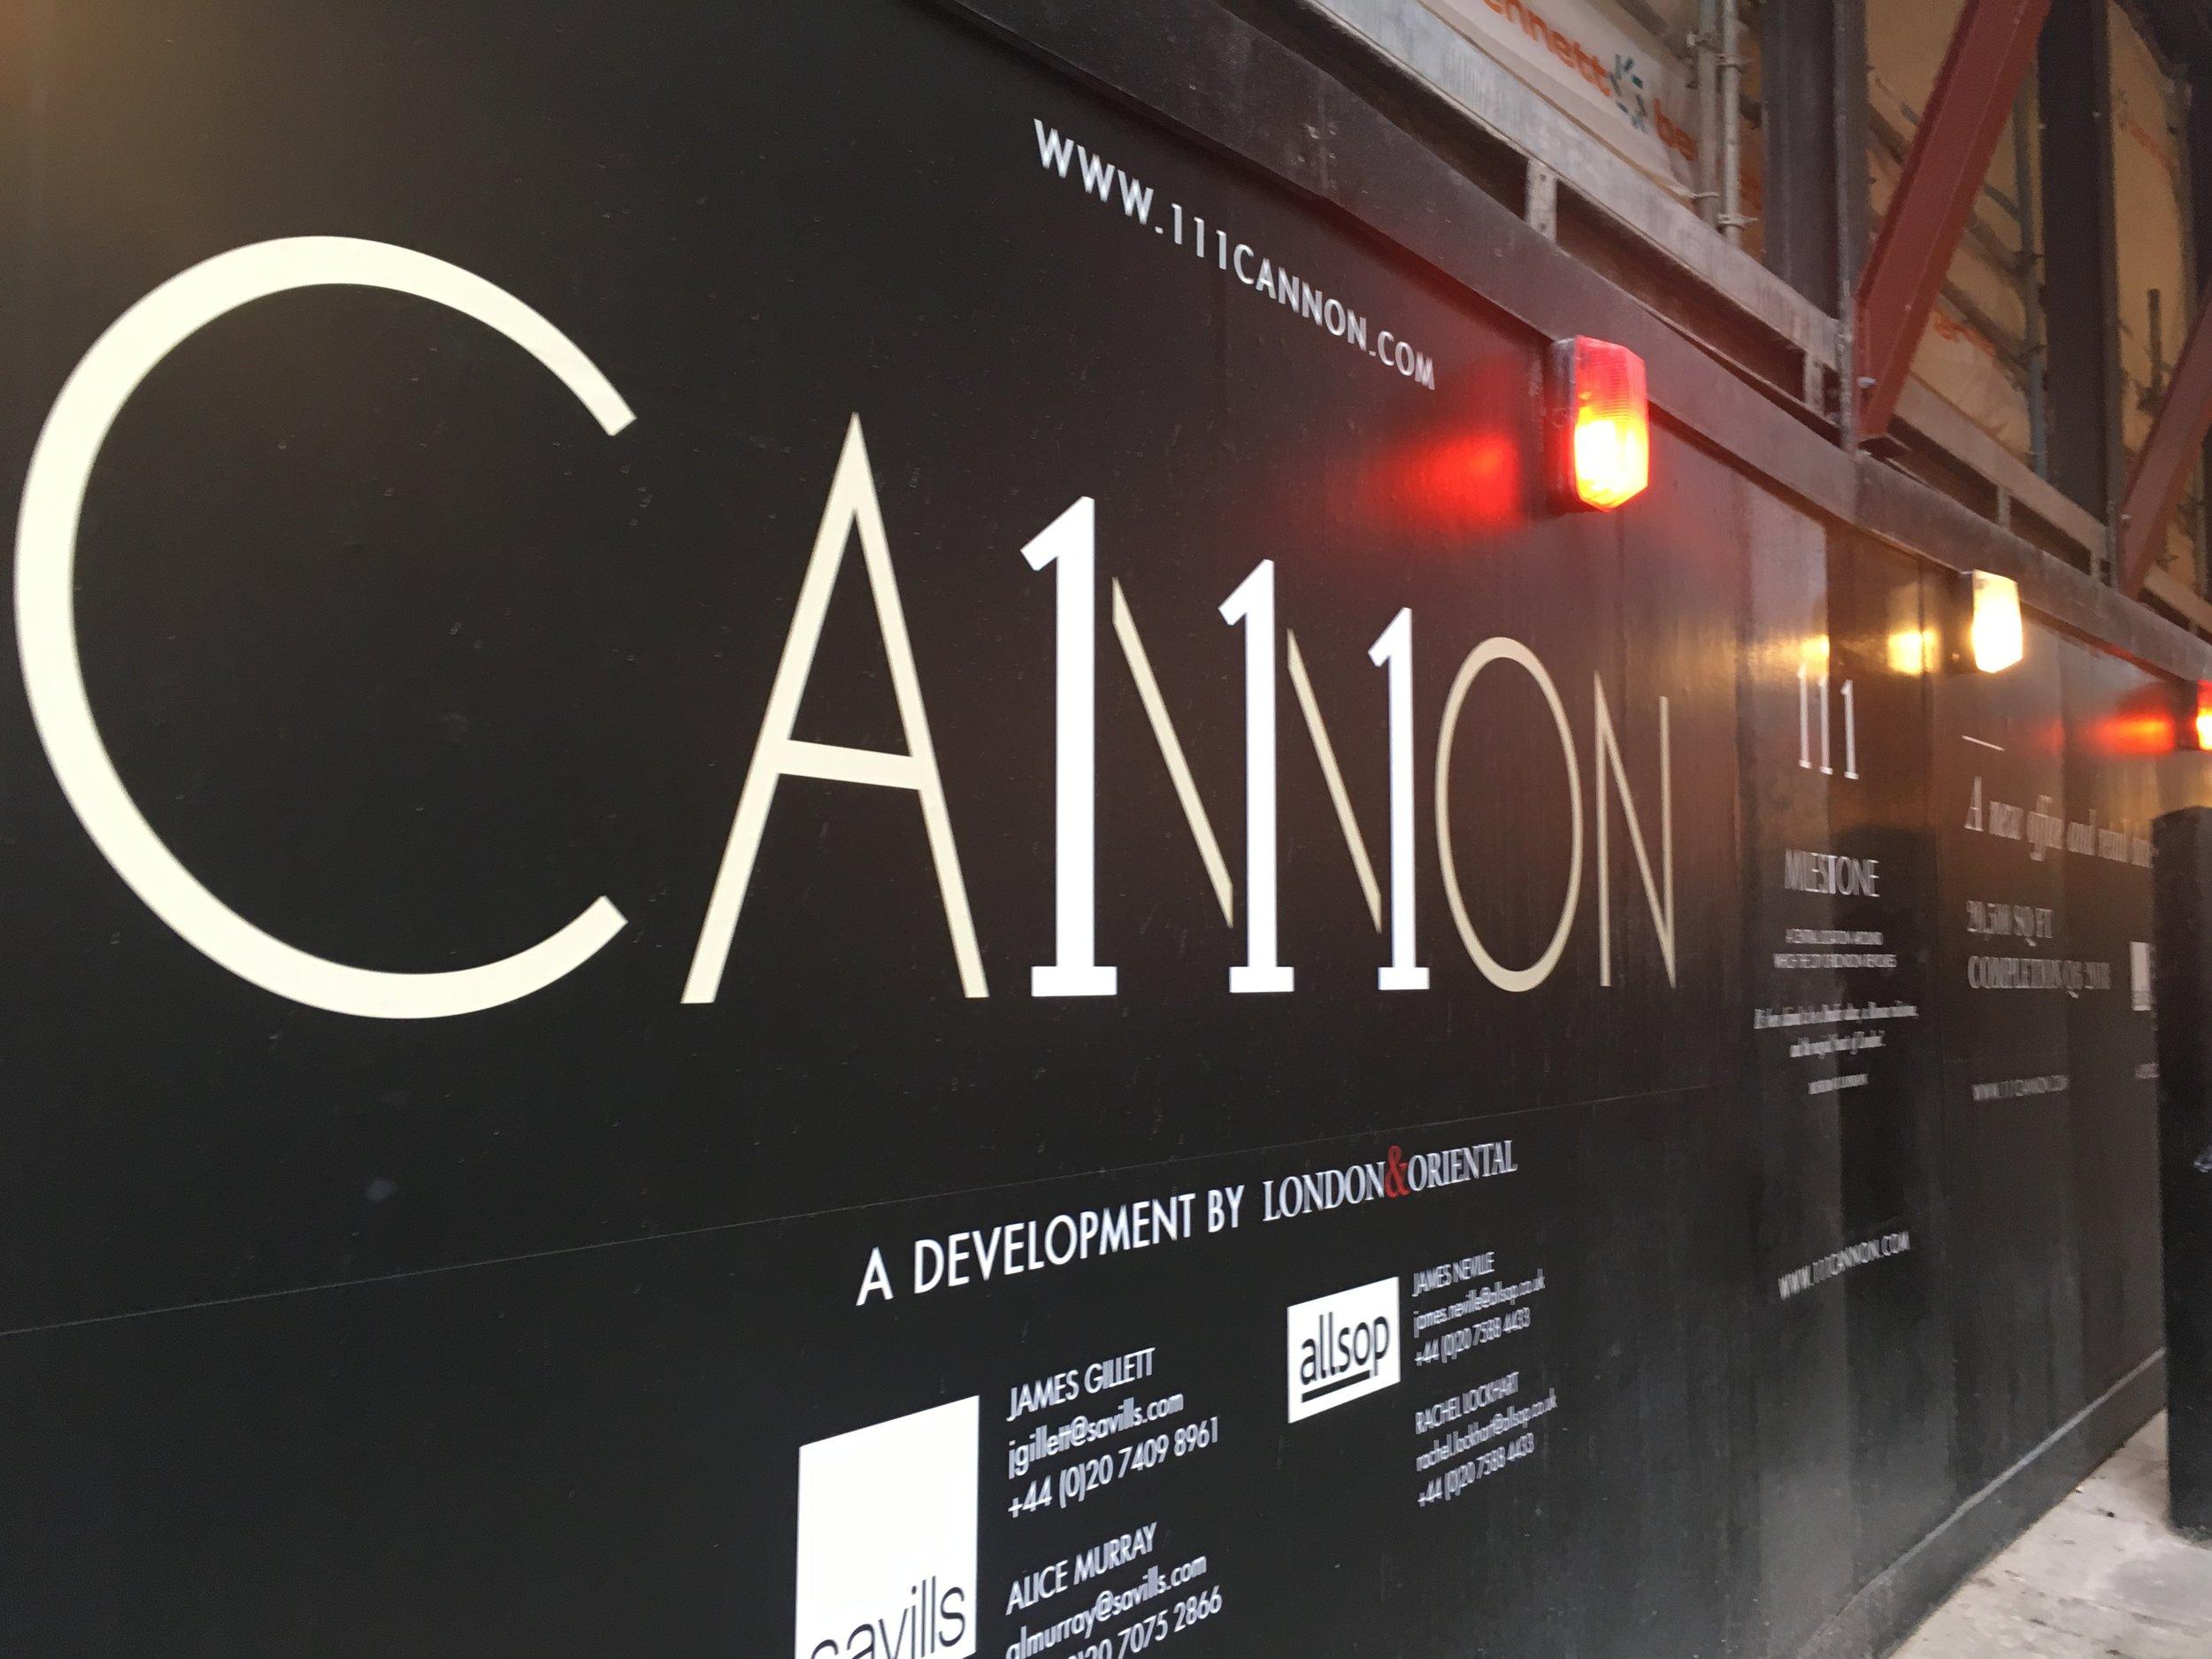 111 cannon.JPG